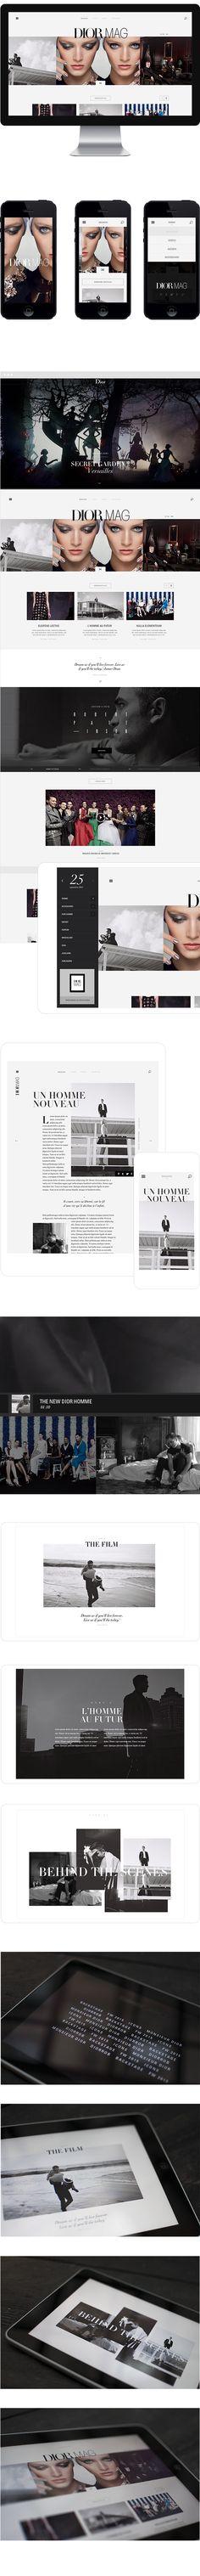 Dior Mag by Jonathan Da Costa, via Behance